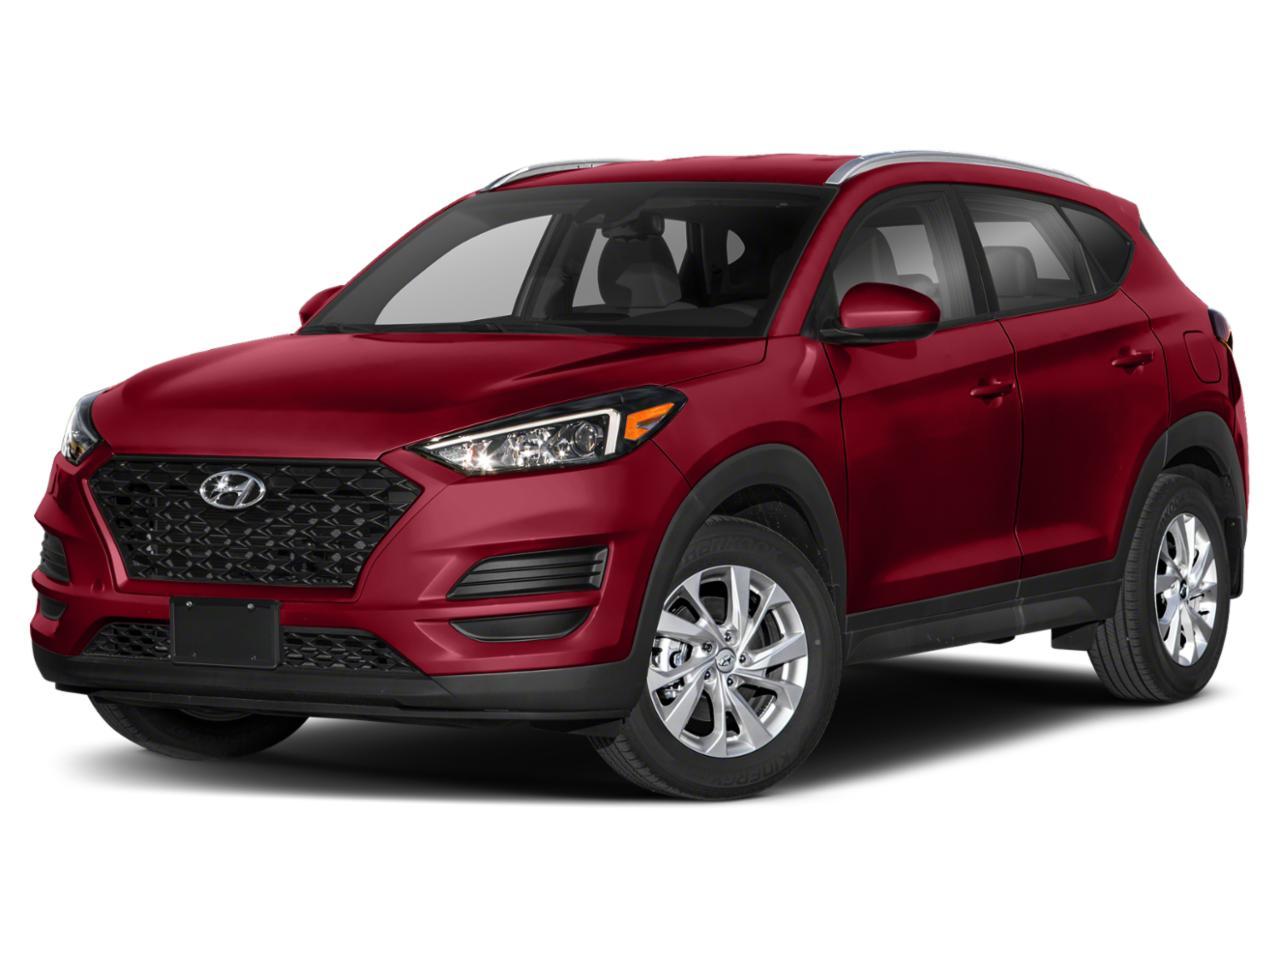 2021 Hyundai Tucson Vehicle Photo in Peoria, IL 61615